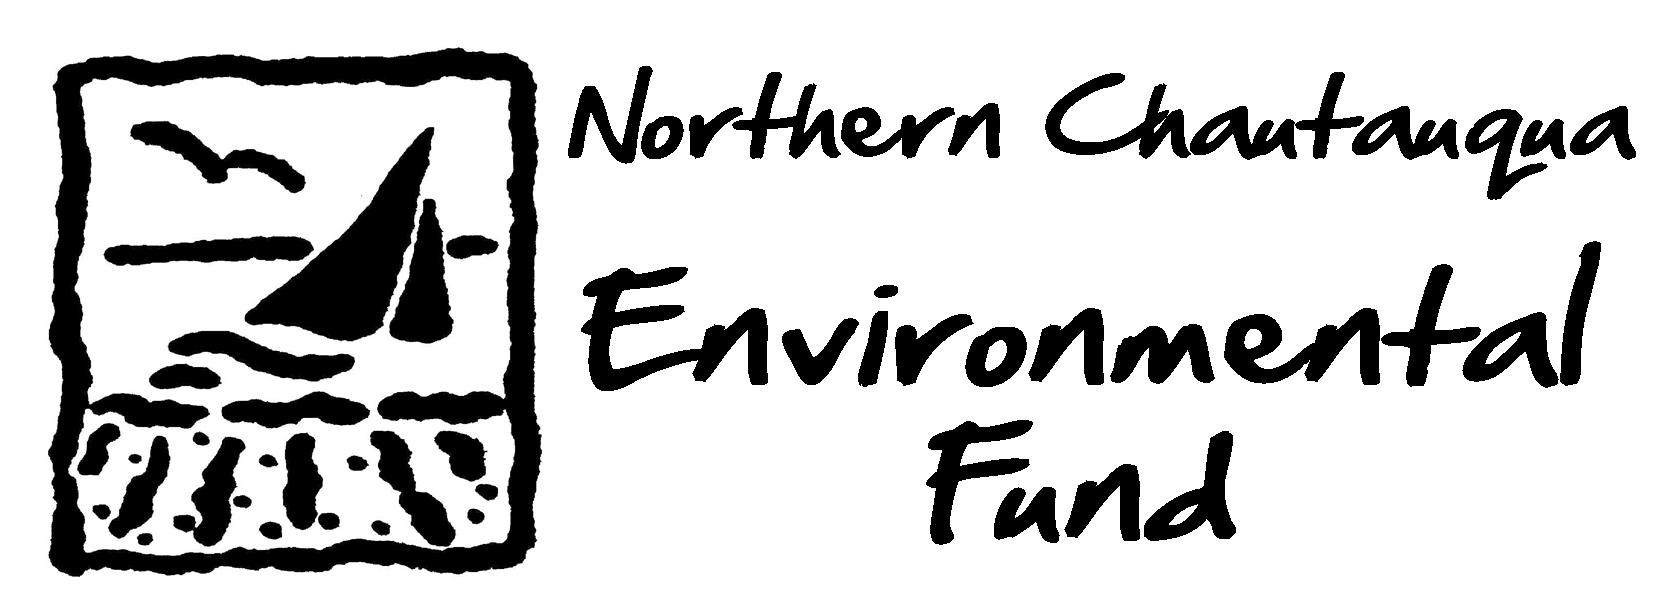 NCEnvironment Fund.jpg